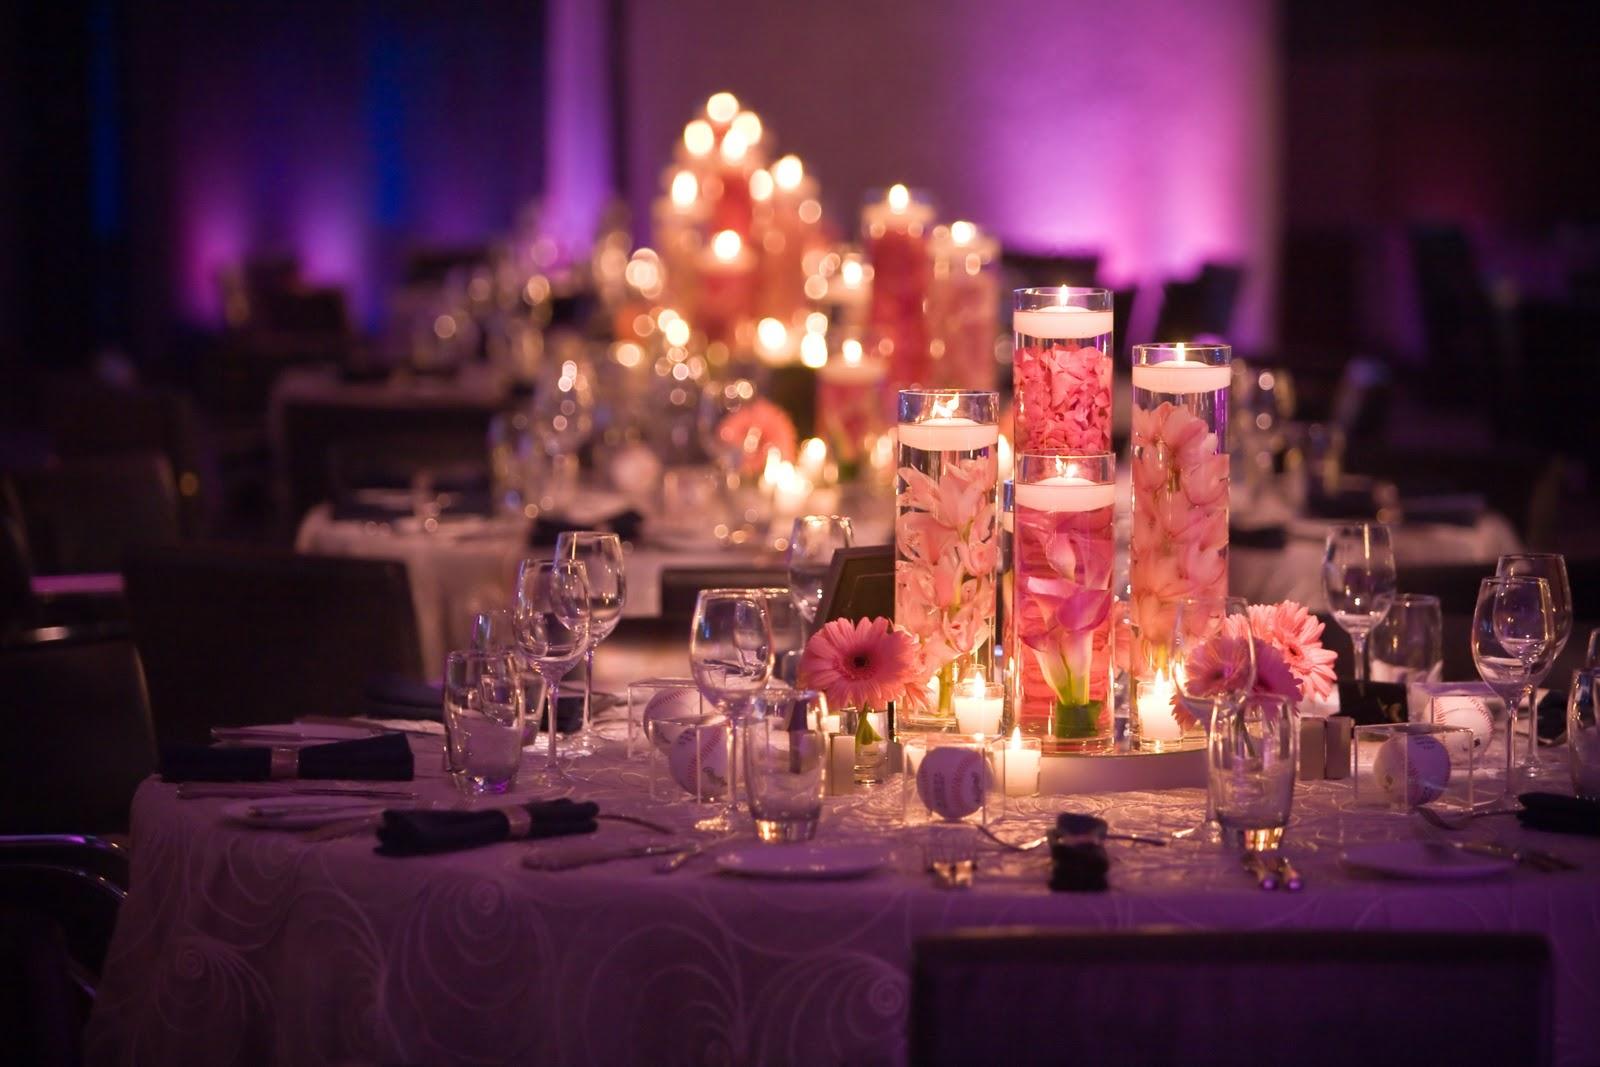 Hindu wedding decoration ideas  Pratima Jagarlamudi pratima on Pinterest